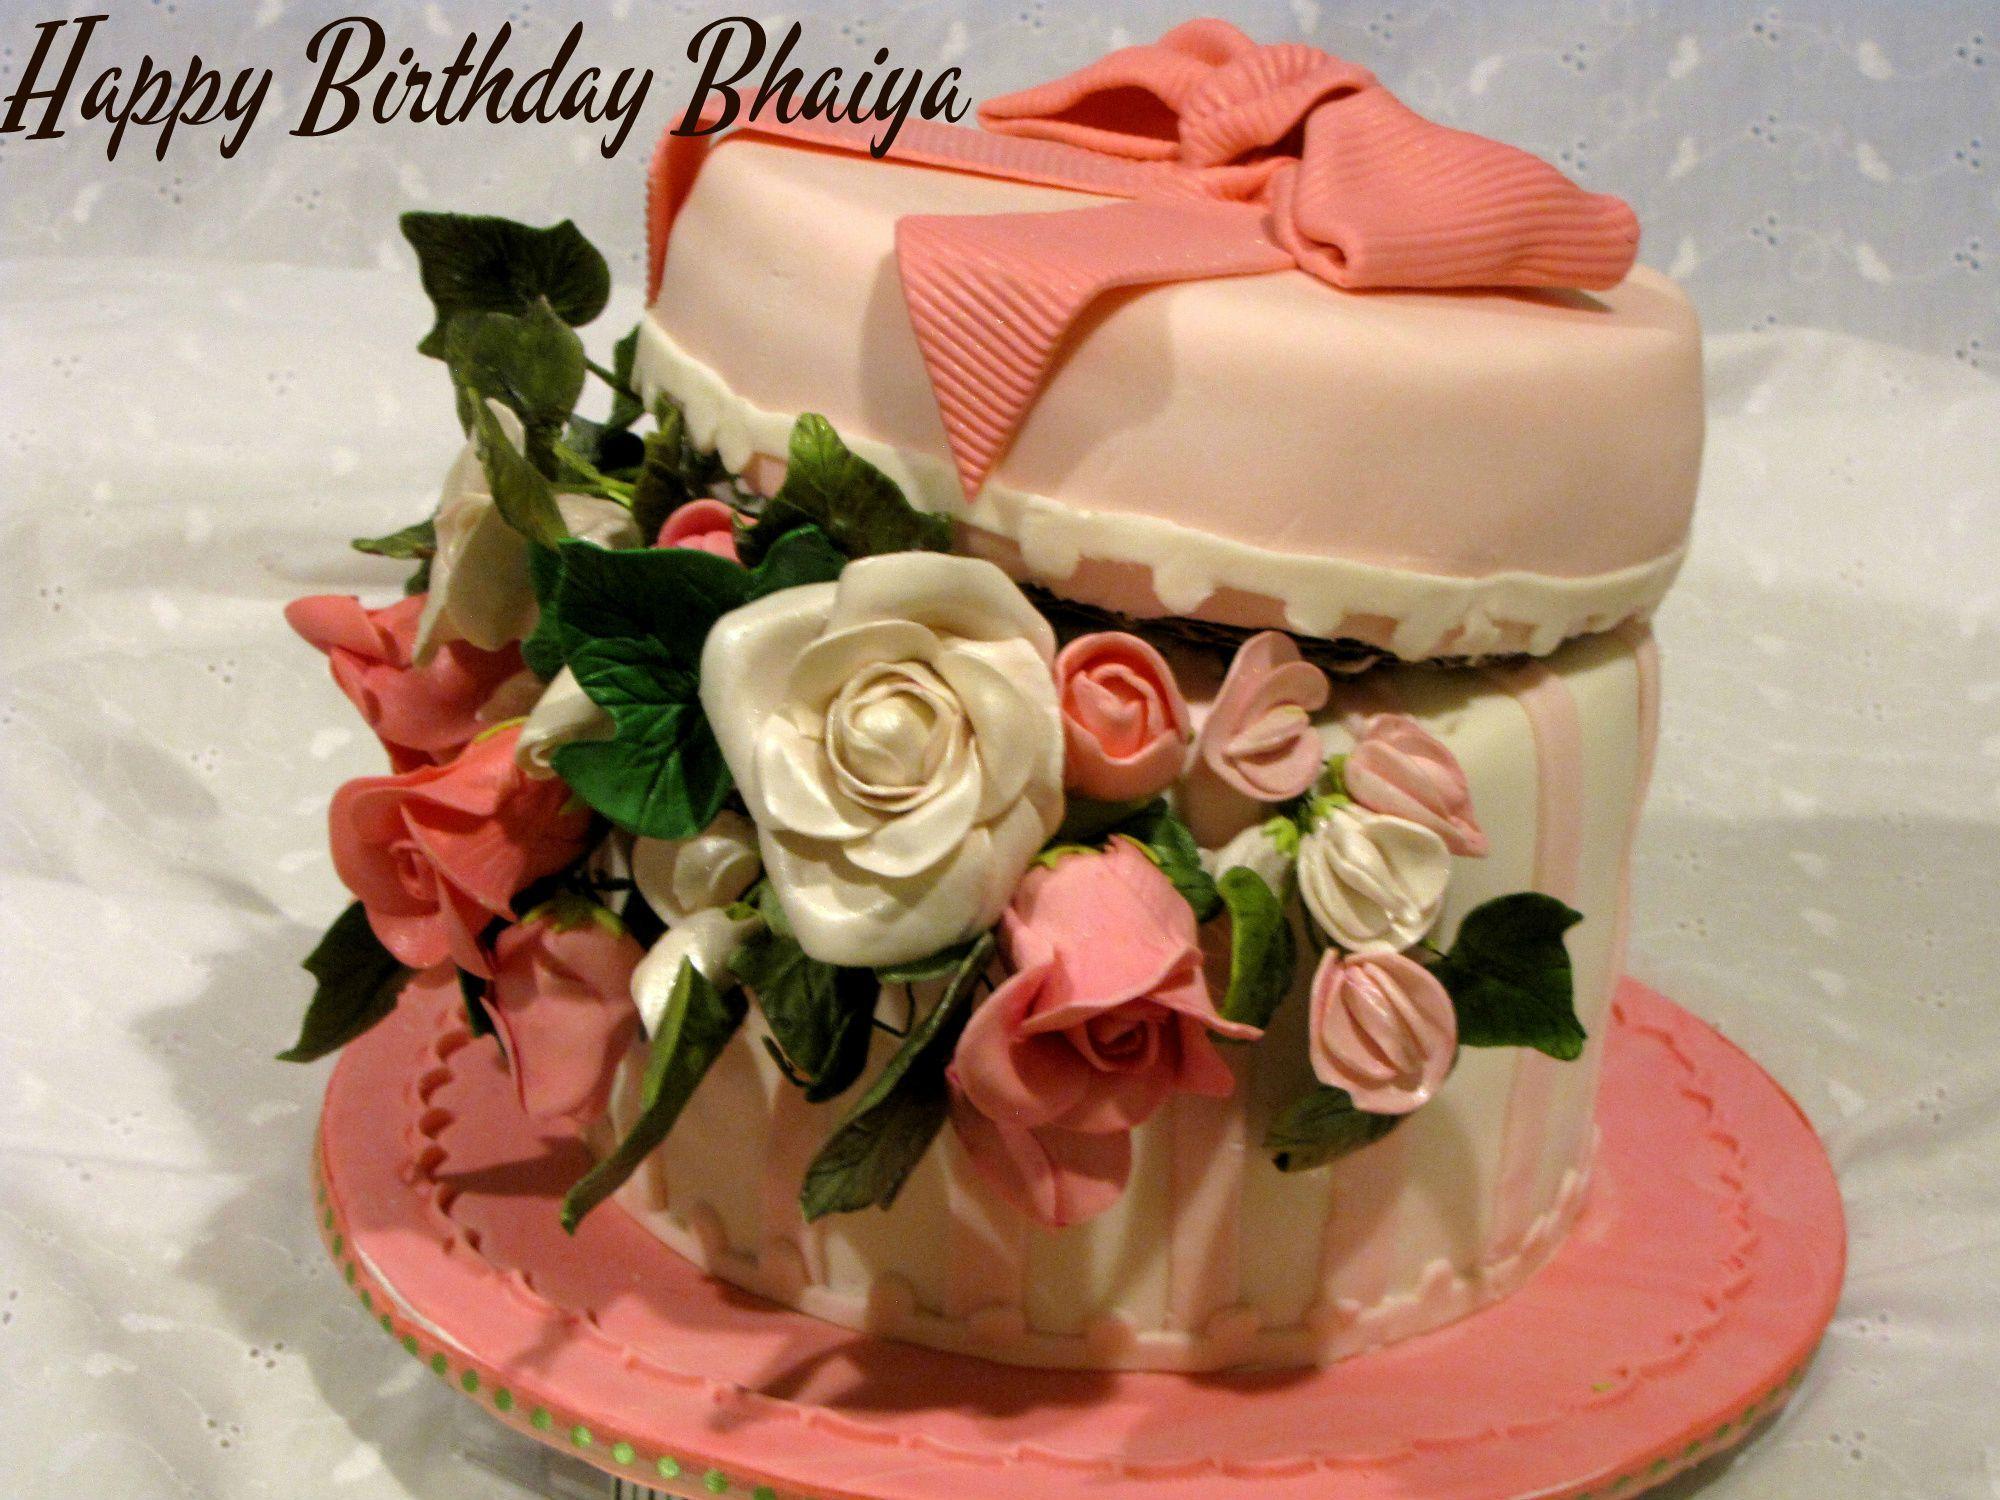 Birthday Cake Images For Bhaiya : Happy Birthday Aadil Jahangeer Bhaiya Pakistan Social Web